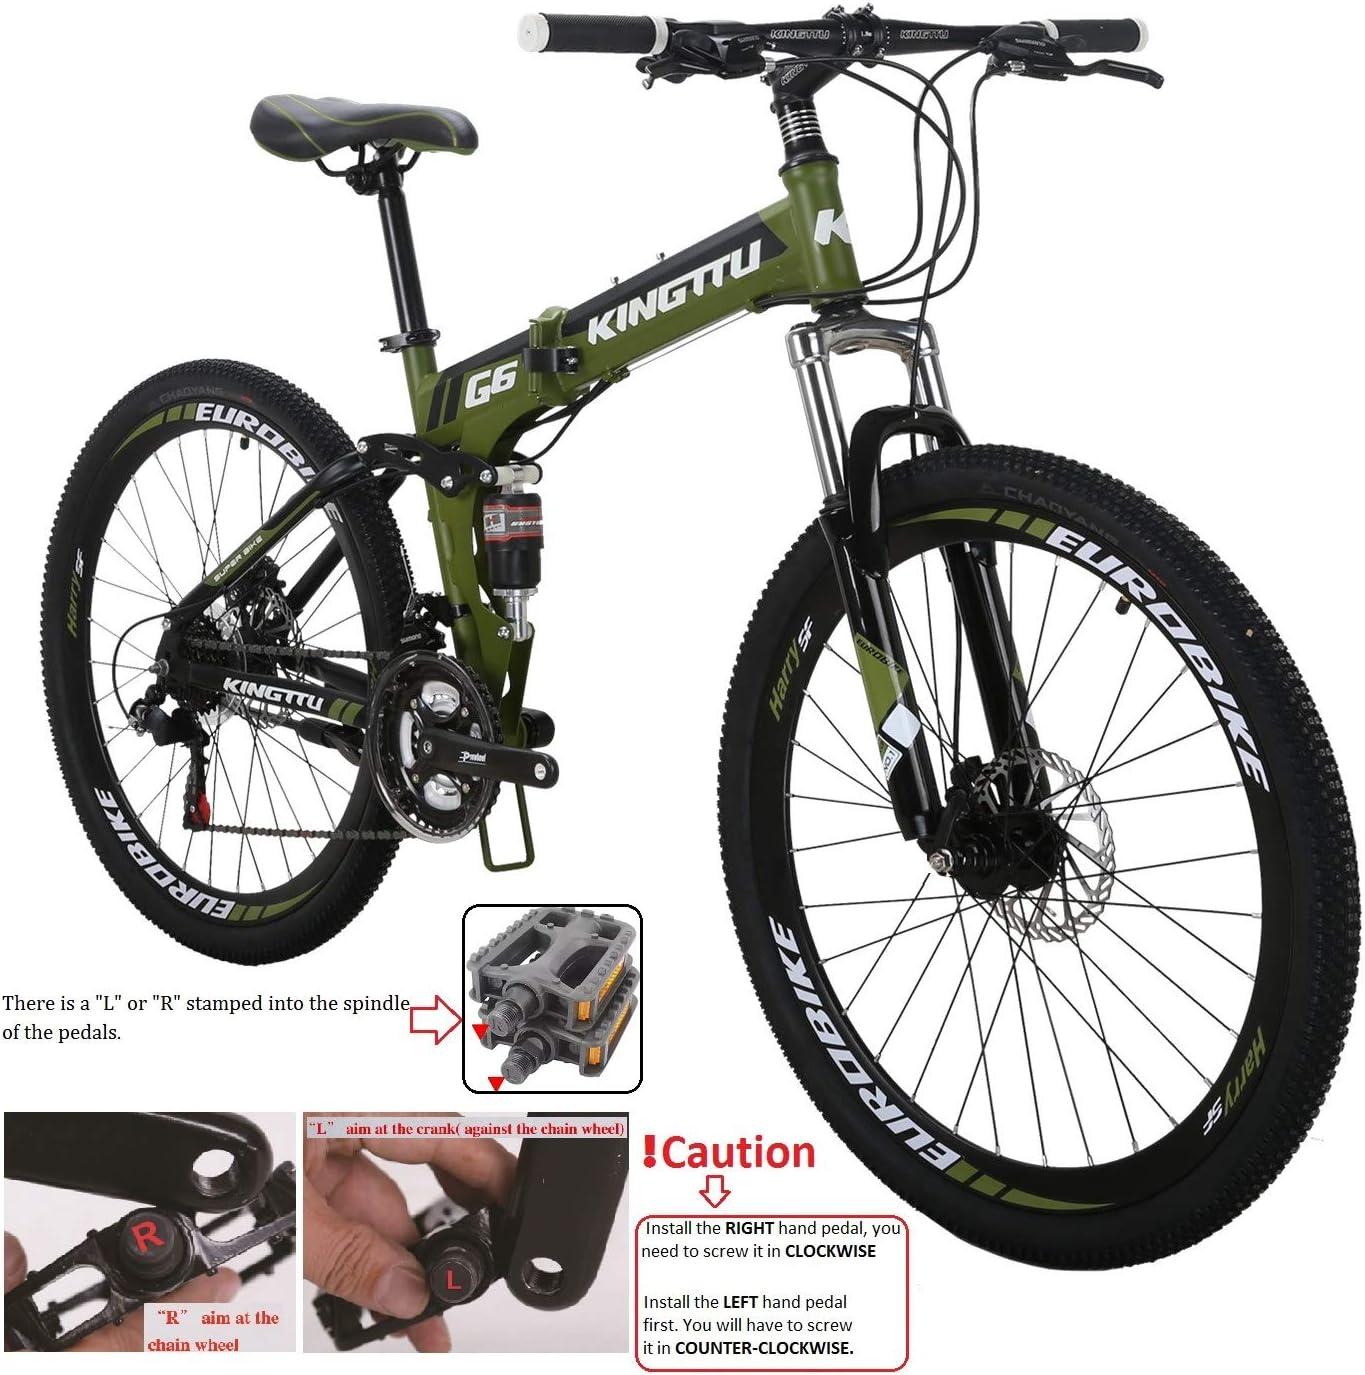 Timegard Cool Road Bike Outdoor Sports Bicycle 26 inch Wheeled Men Women Road Bike